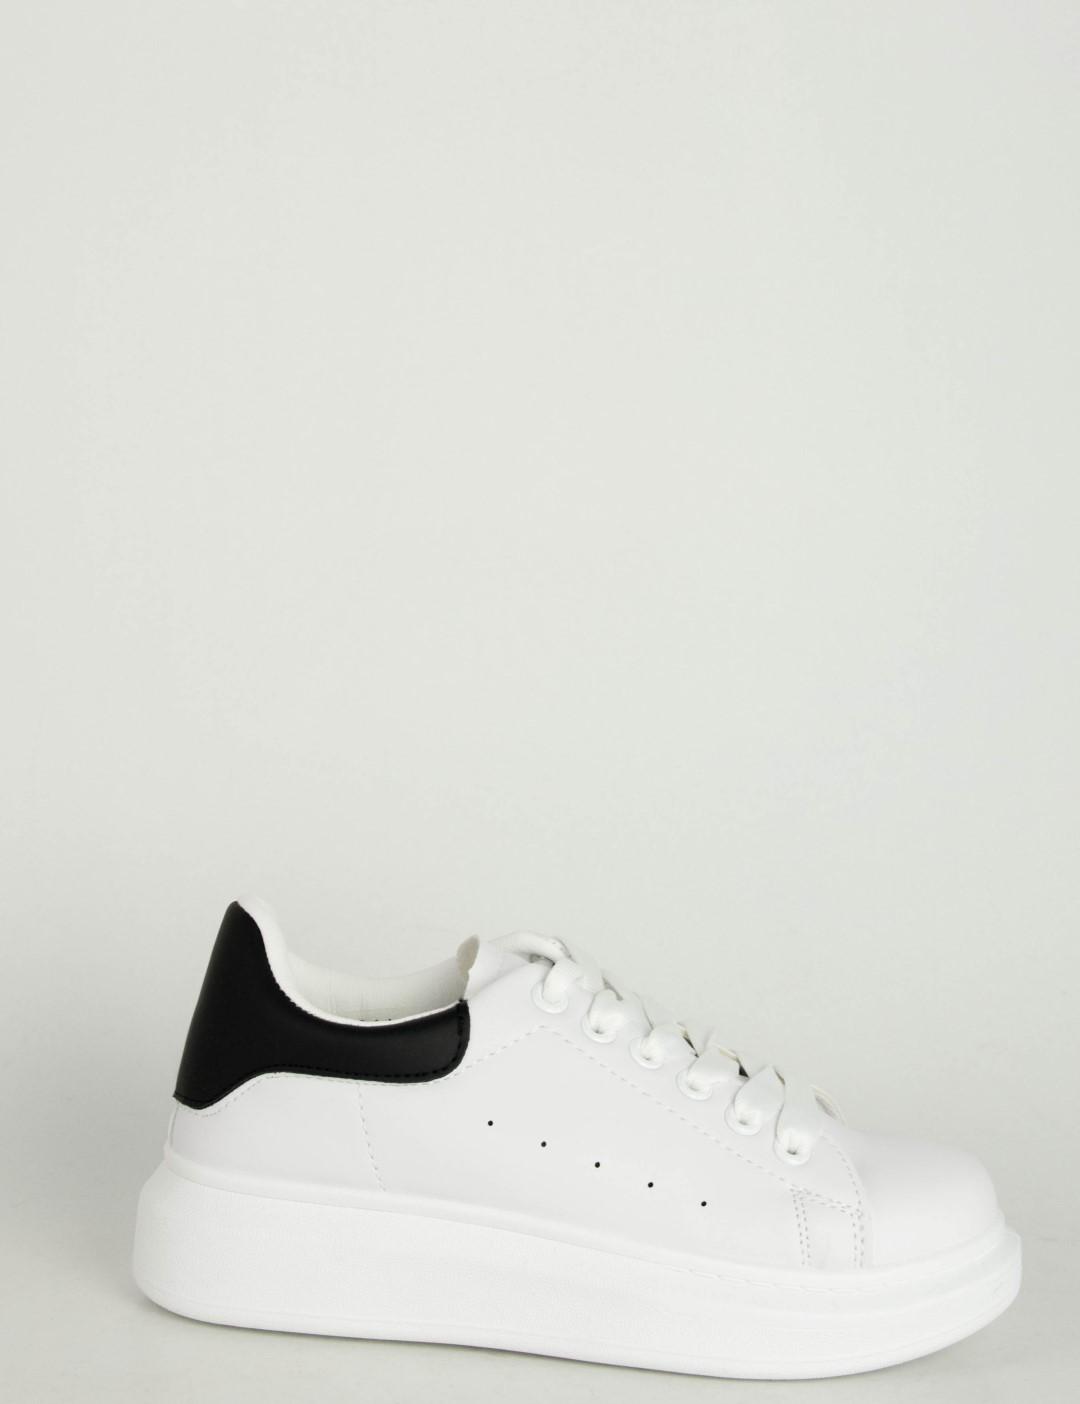 7627dd5d99d Ανδρικά λευκά μαύρο δίσολα Sneakers λαστιχένια σόλα M723R